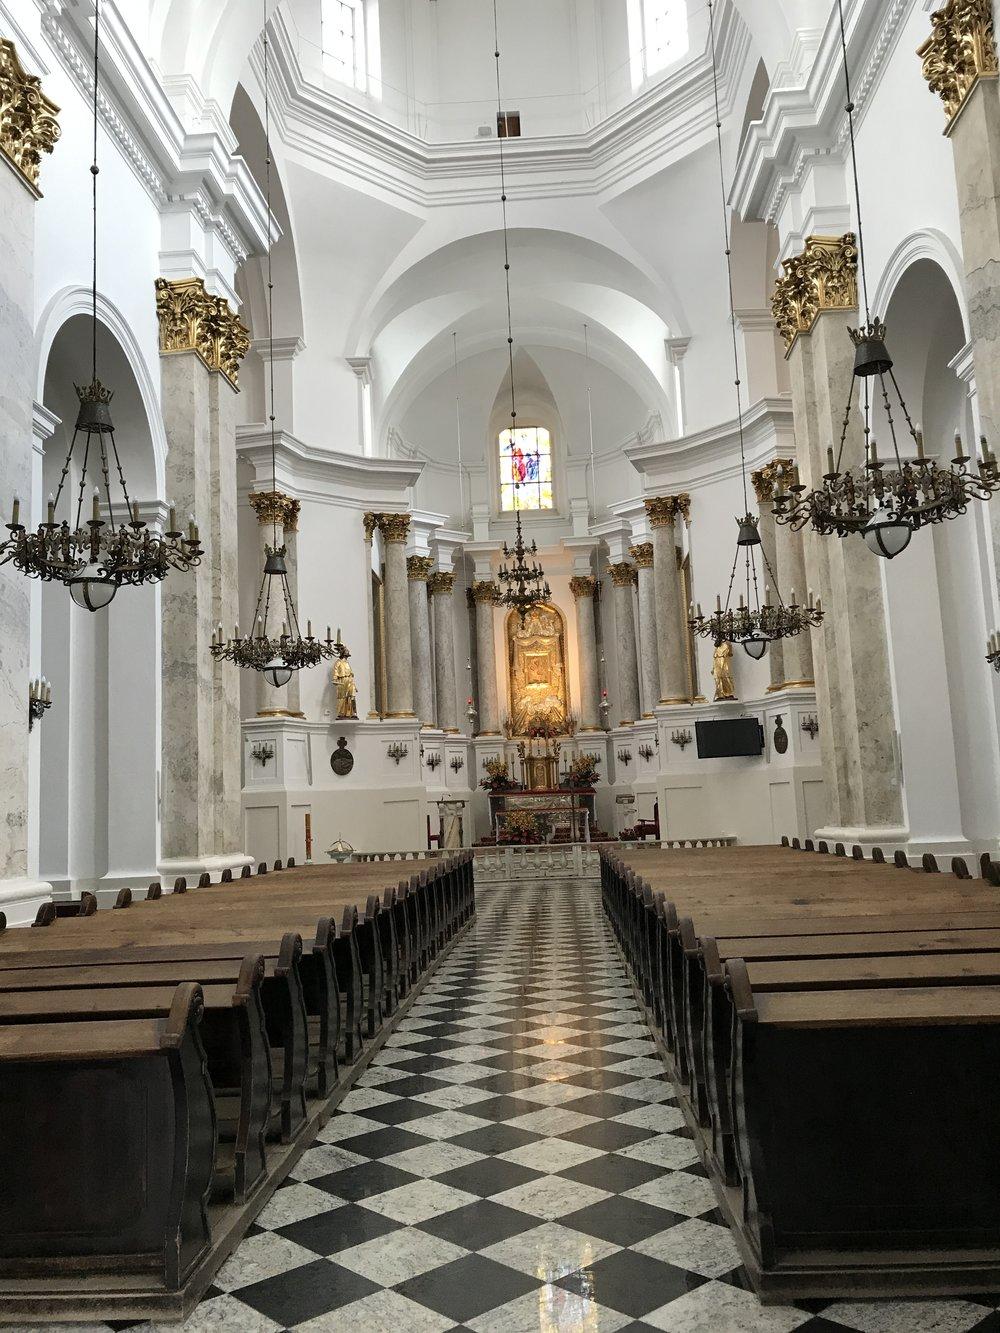 Interior of Chelm Basilica